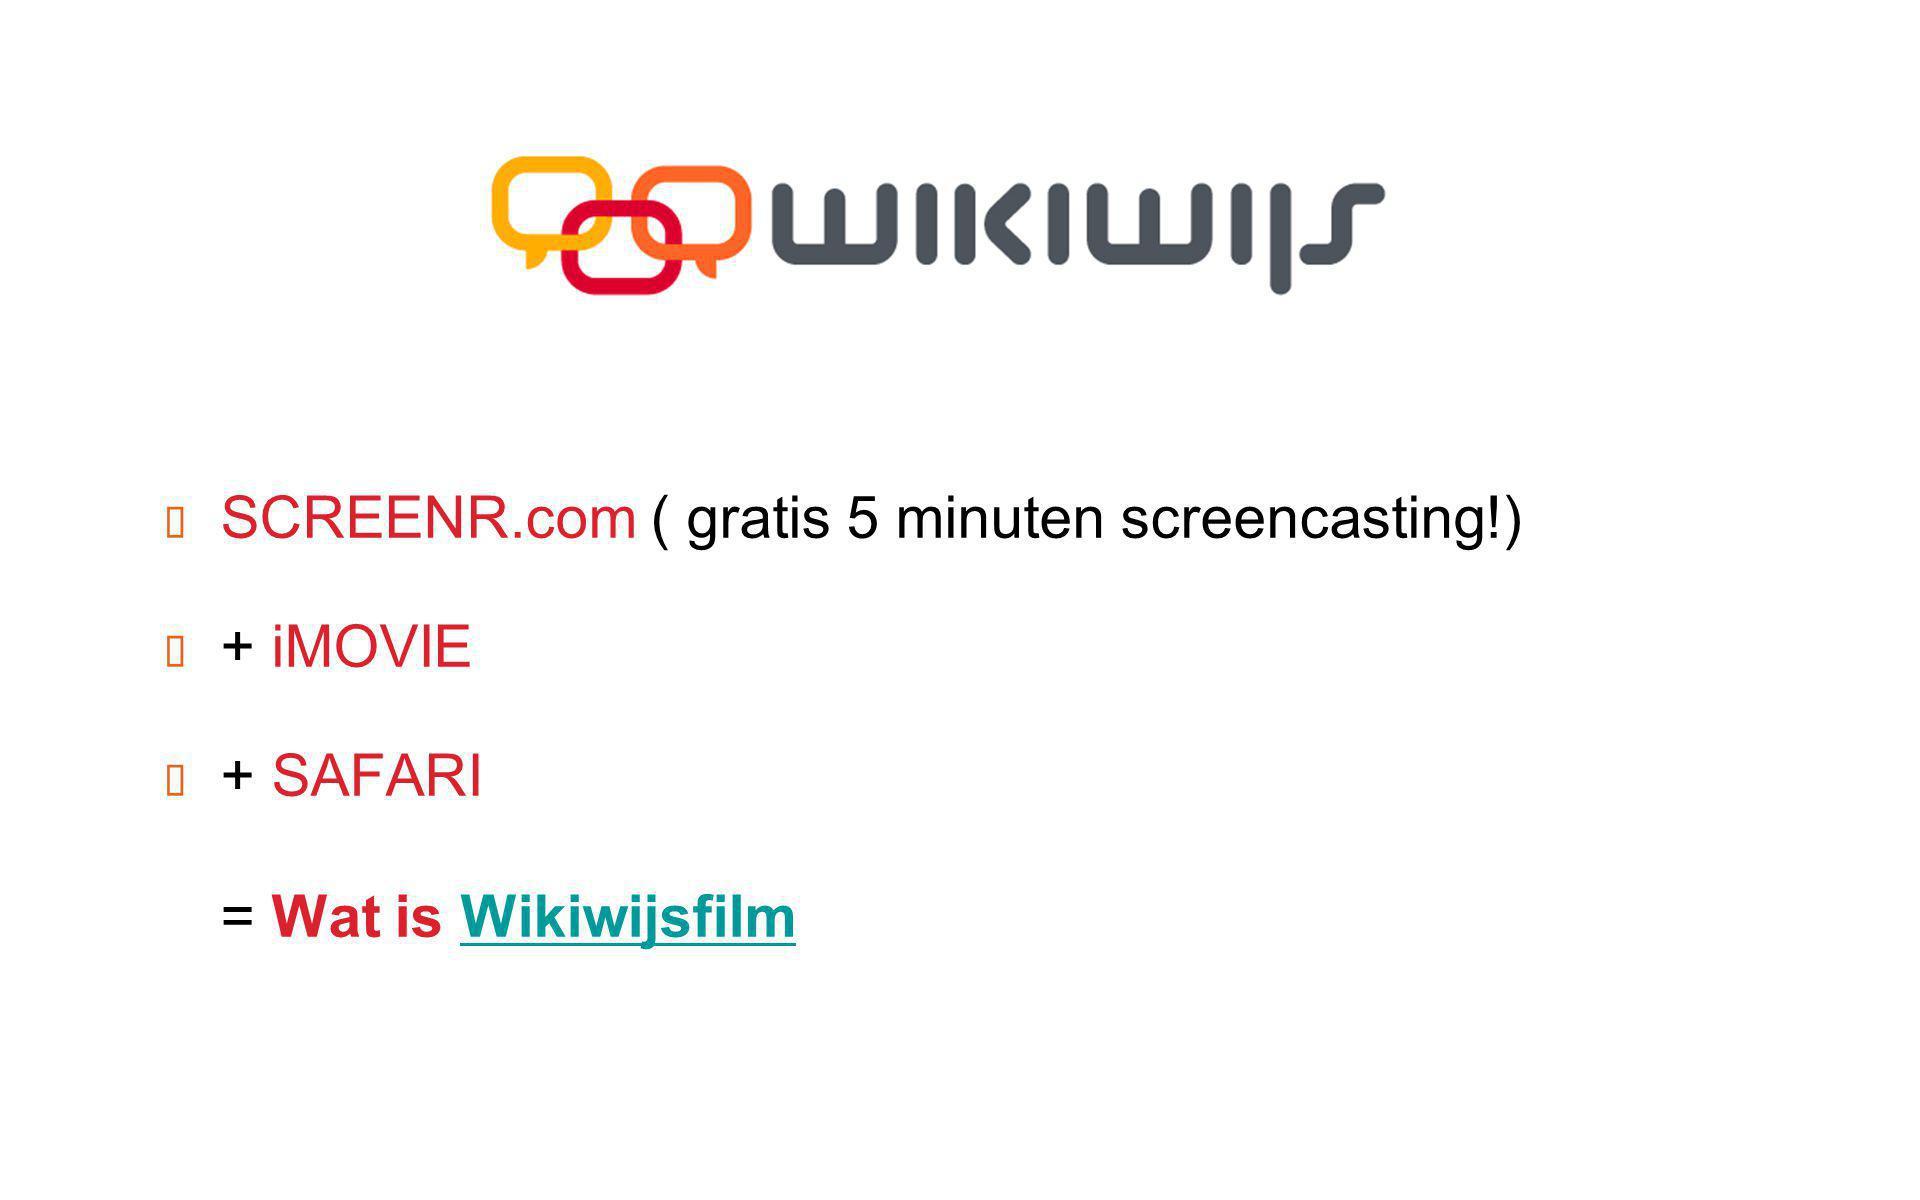 ✦ SCREENR.com ( gratis 5 minuten screencasting!) ✦ + iMOVIE ✦ + SAFARI = Wat is WikiwijsfilmWikiwijsfilm